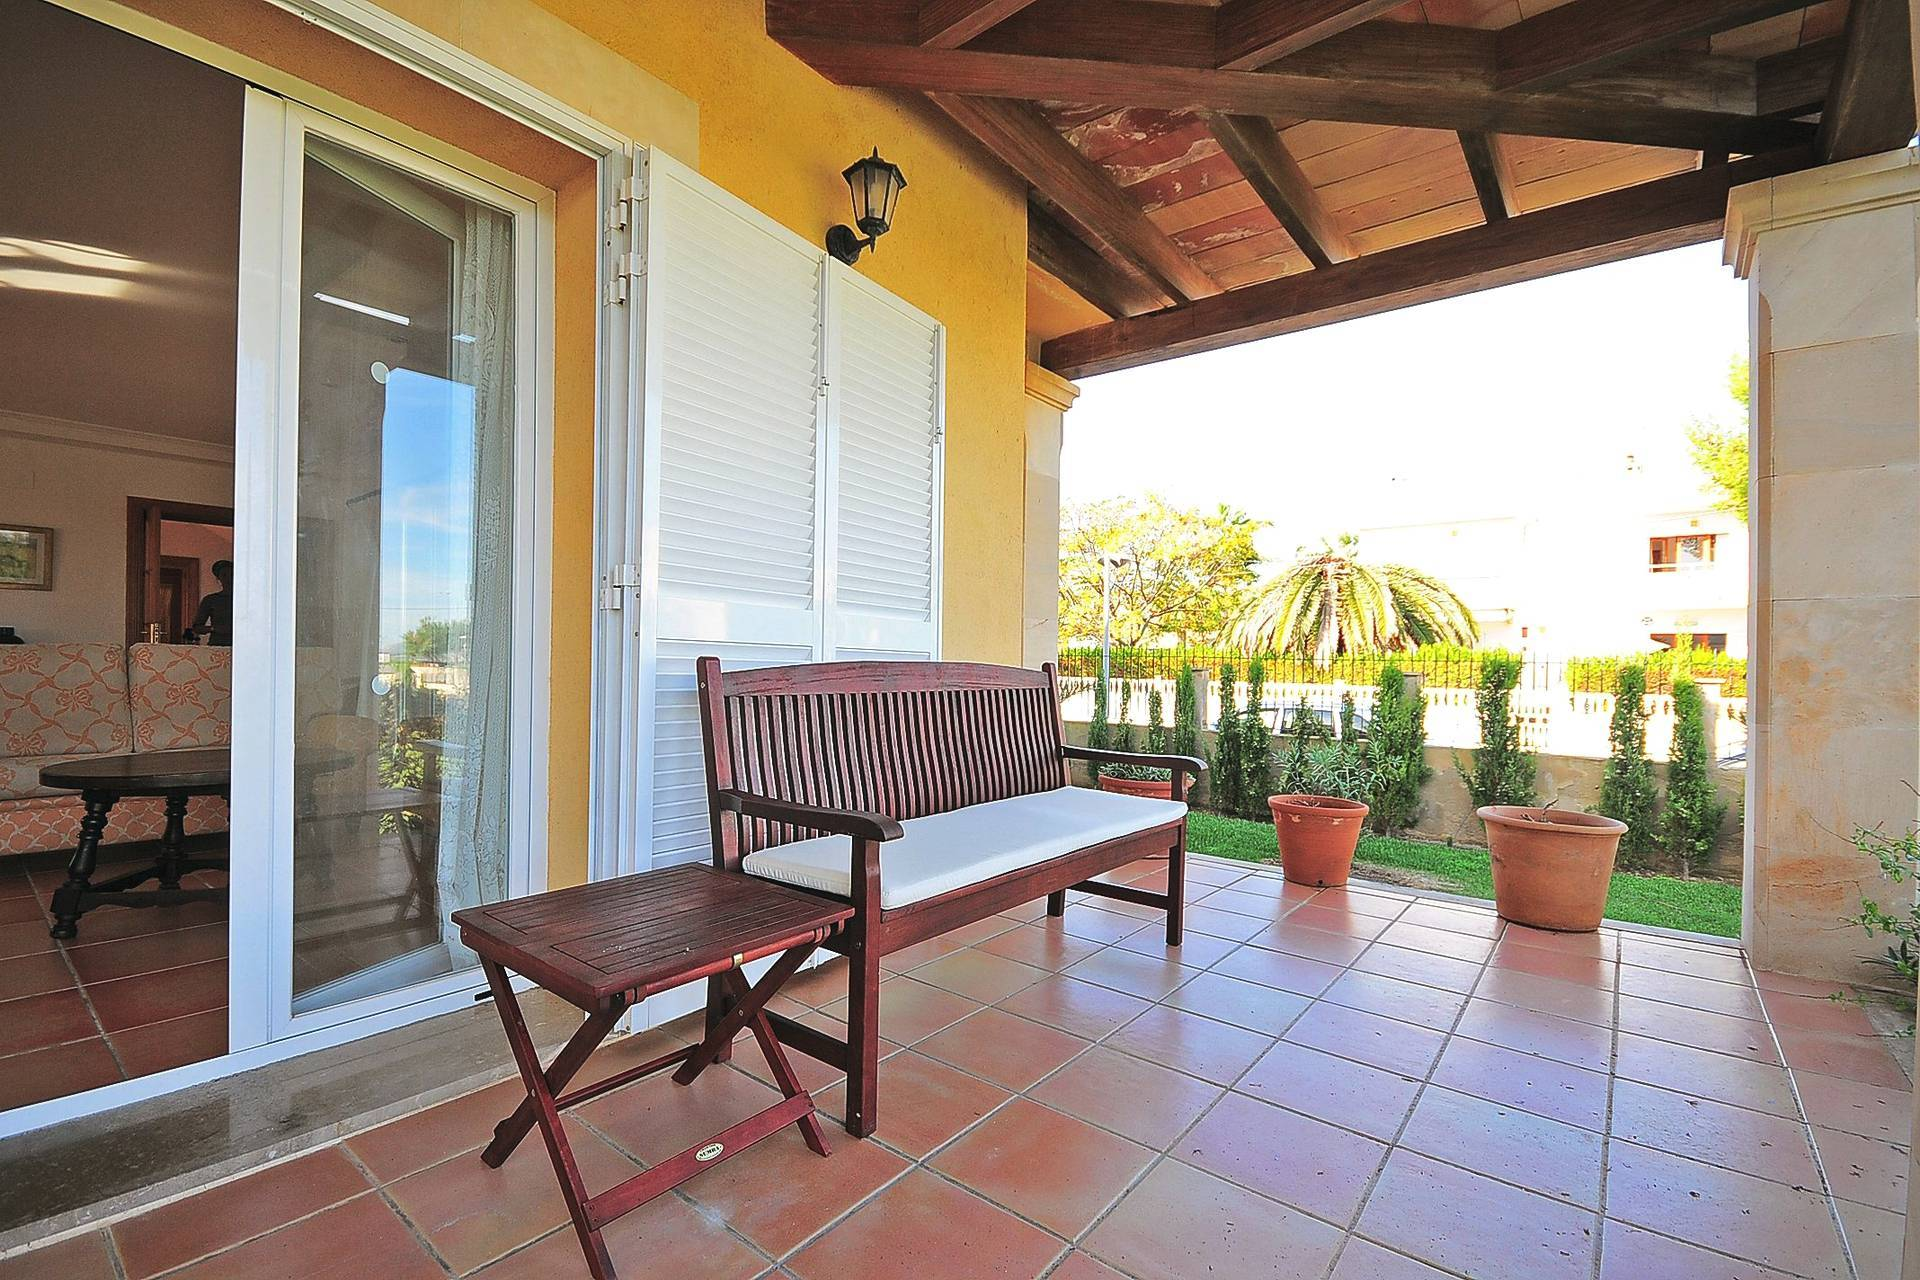 01-233 Ferienhaus am Strand Mallorca Norden Bild 2